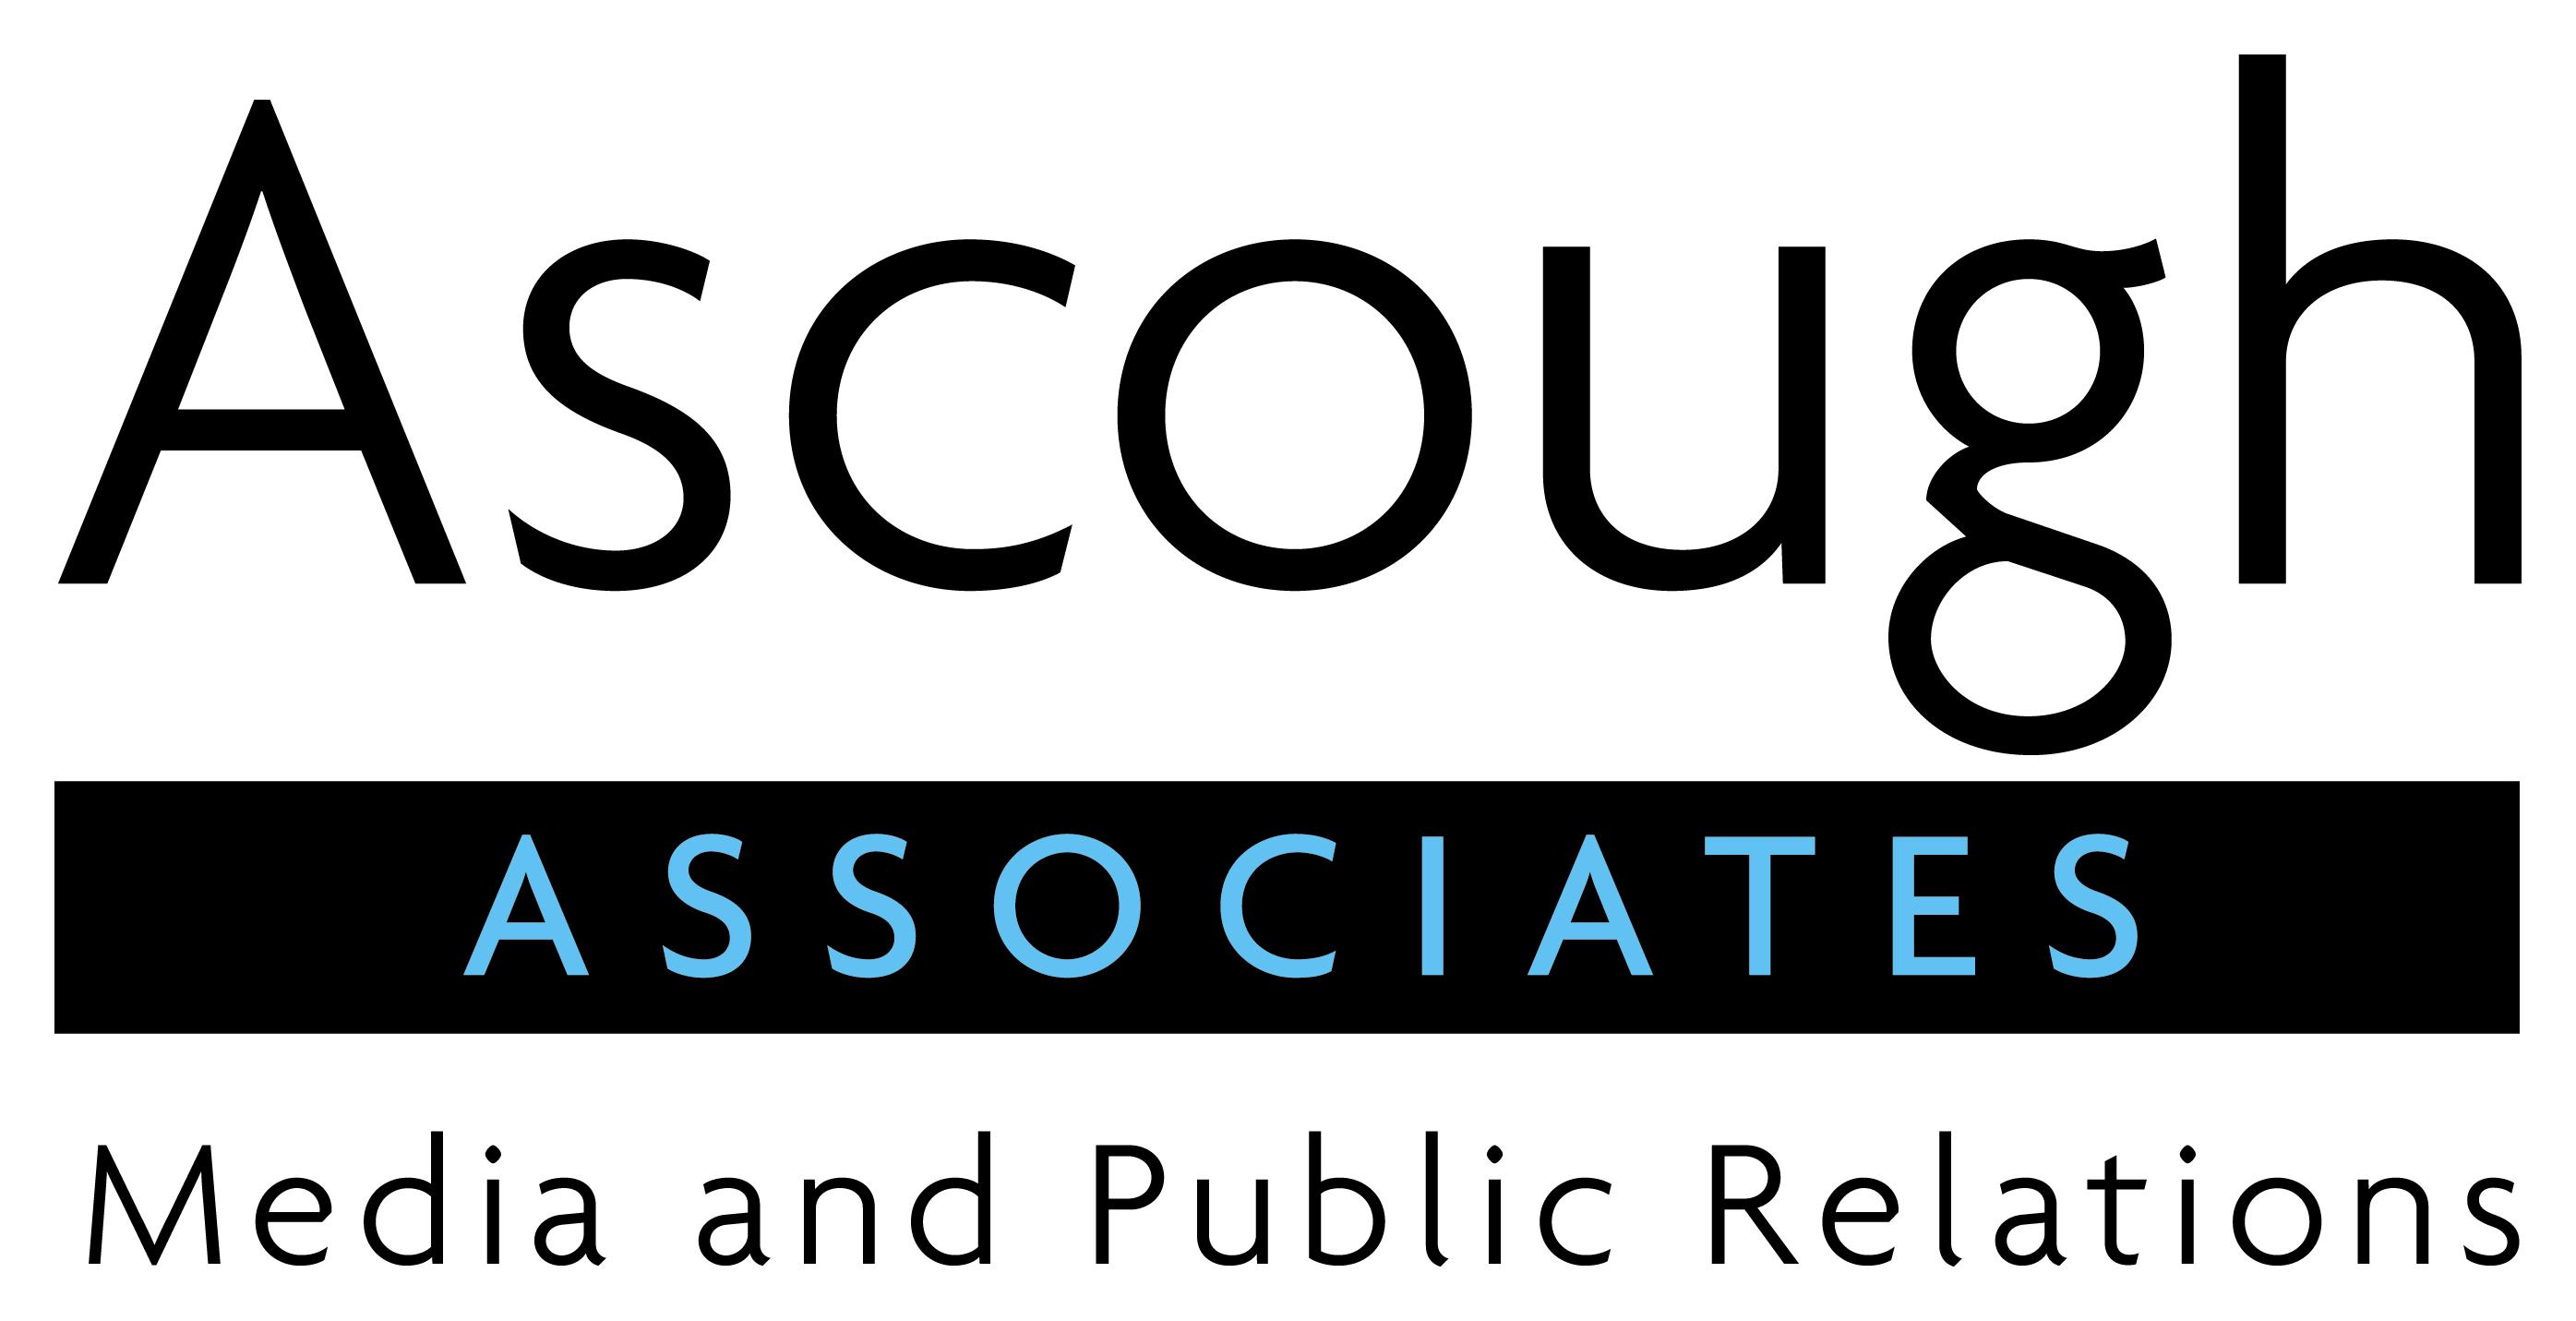 Ascough Associates